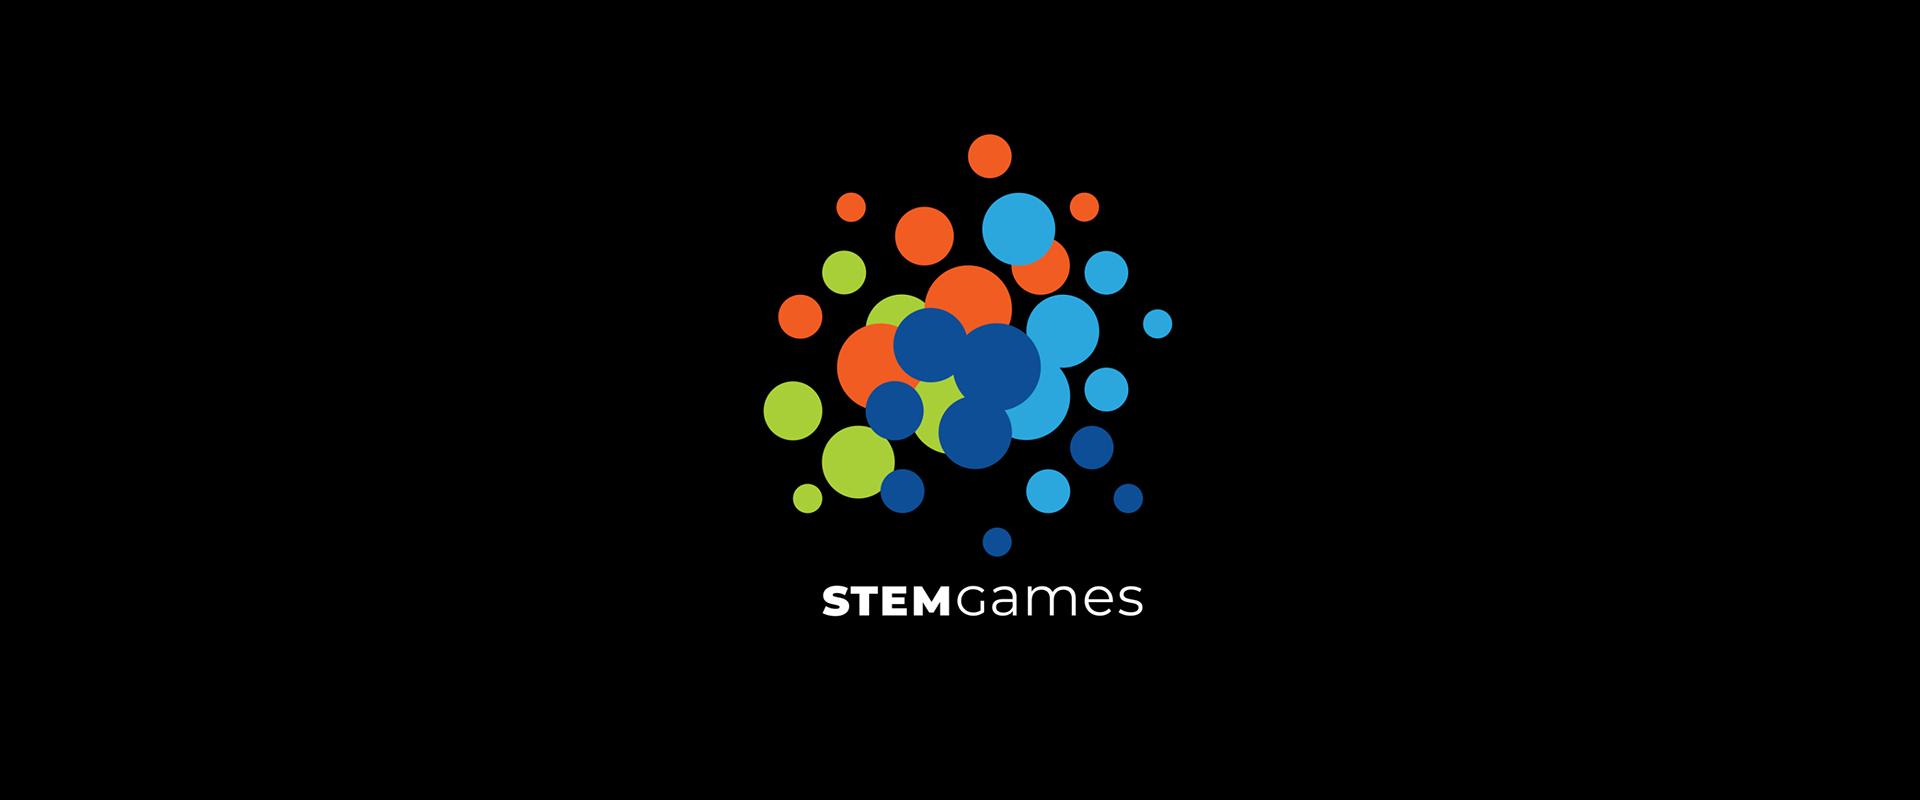 Projektna Produkcija - Projekt - STEM games animacija dobrodošlice